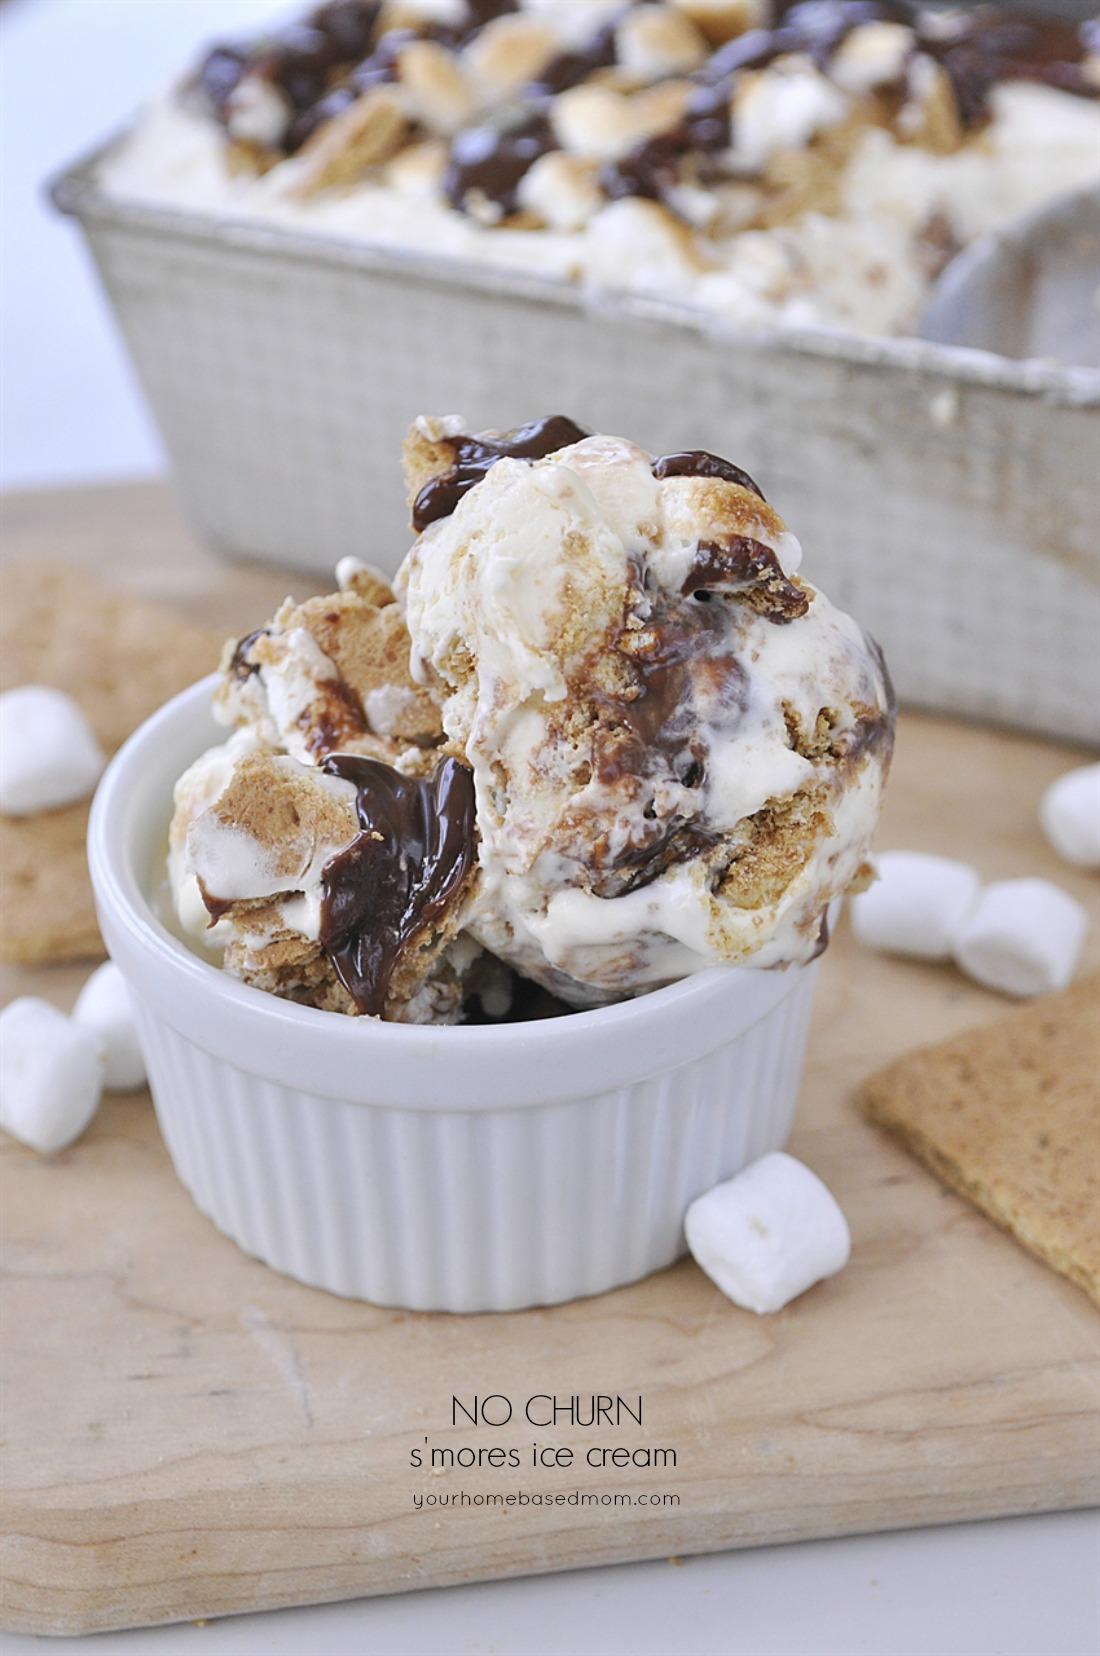 S'mores No Churn Ice Cream